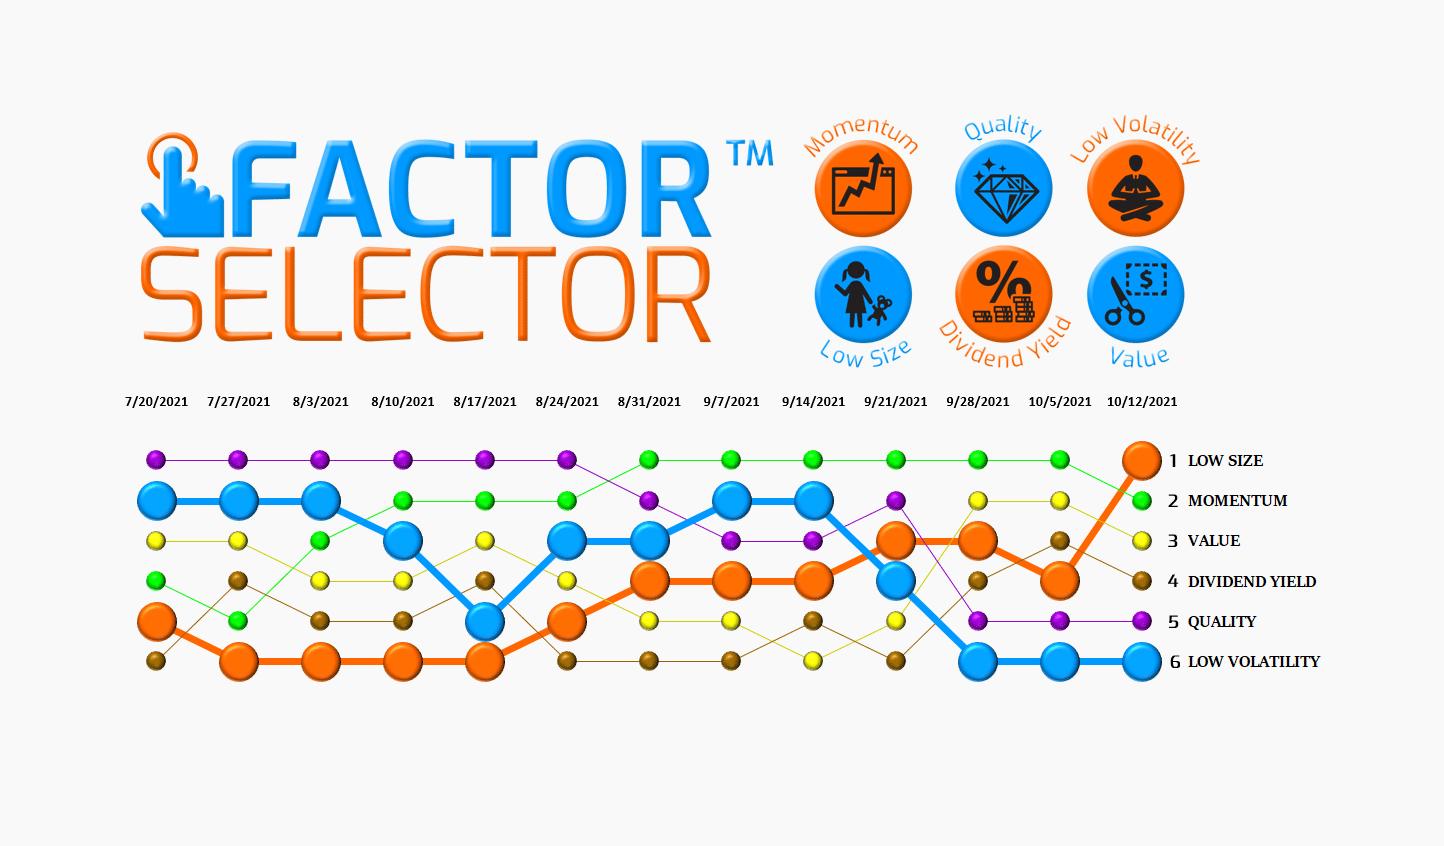 Factor Selector™  – 10/13/21 via @https://www.pinterest.com/market_scholars